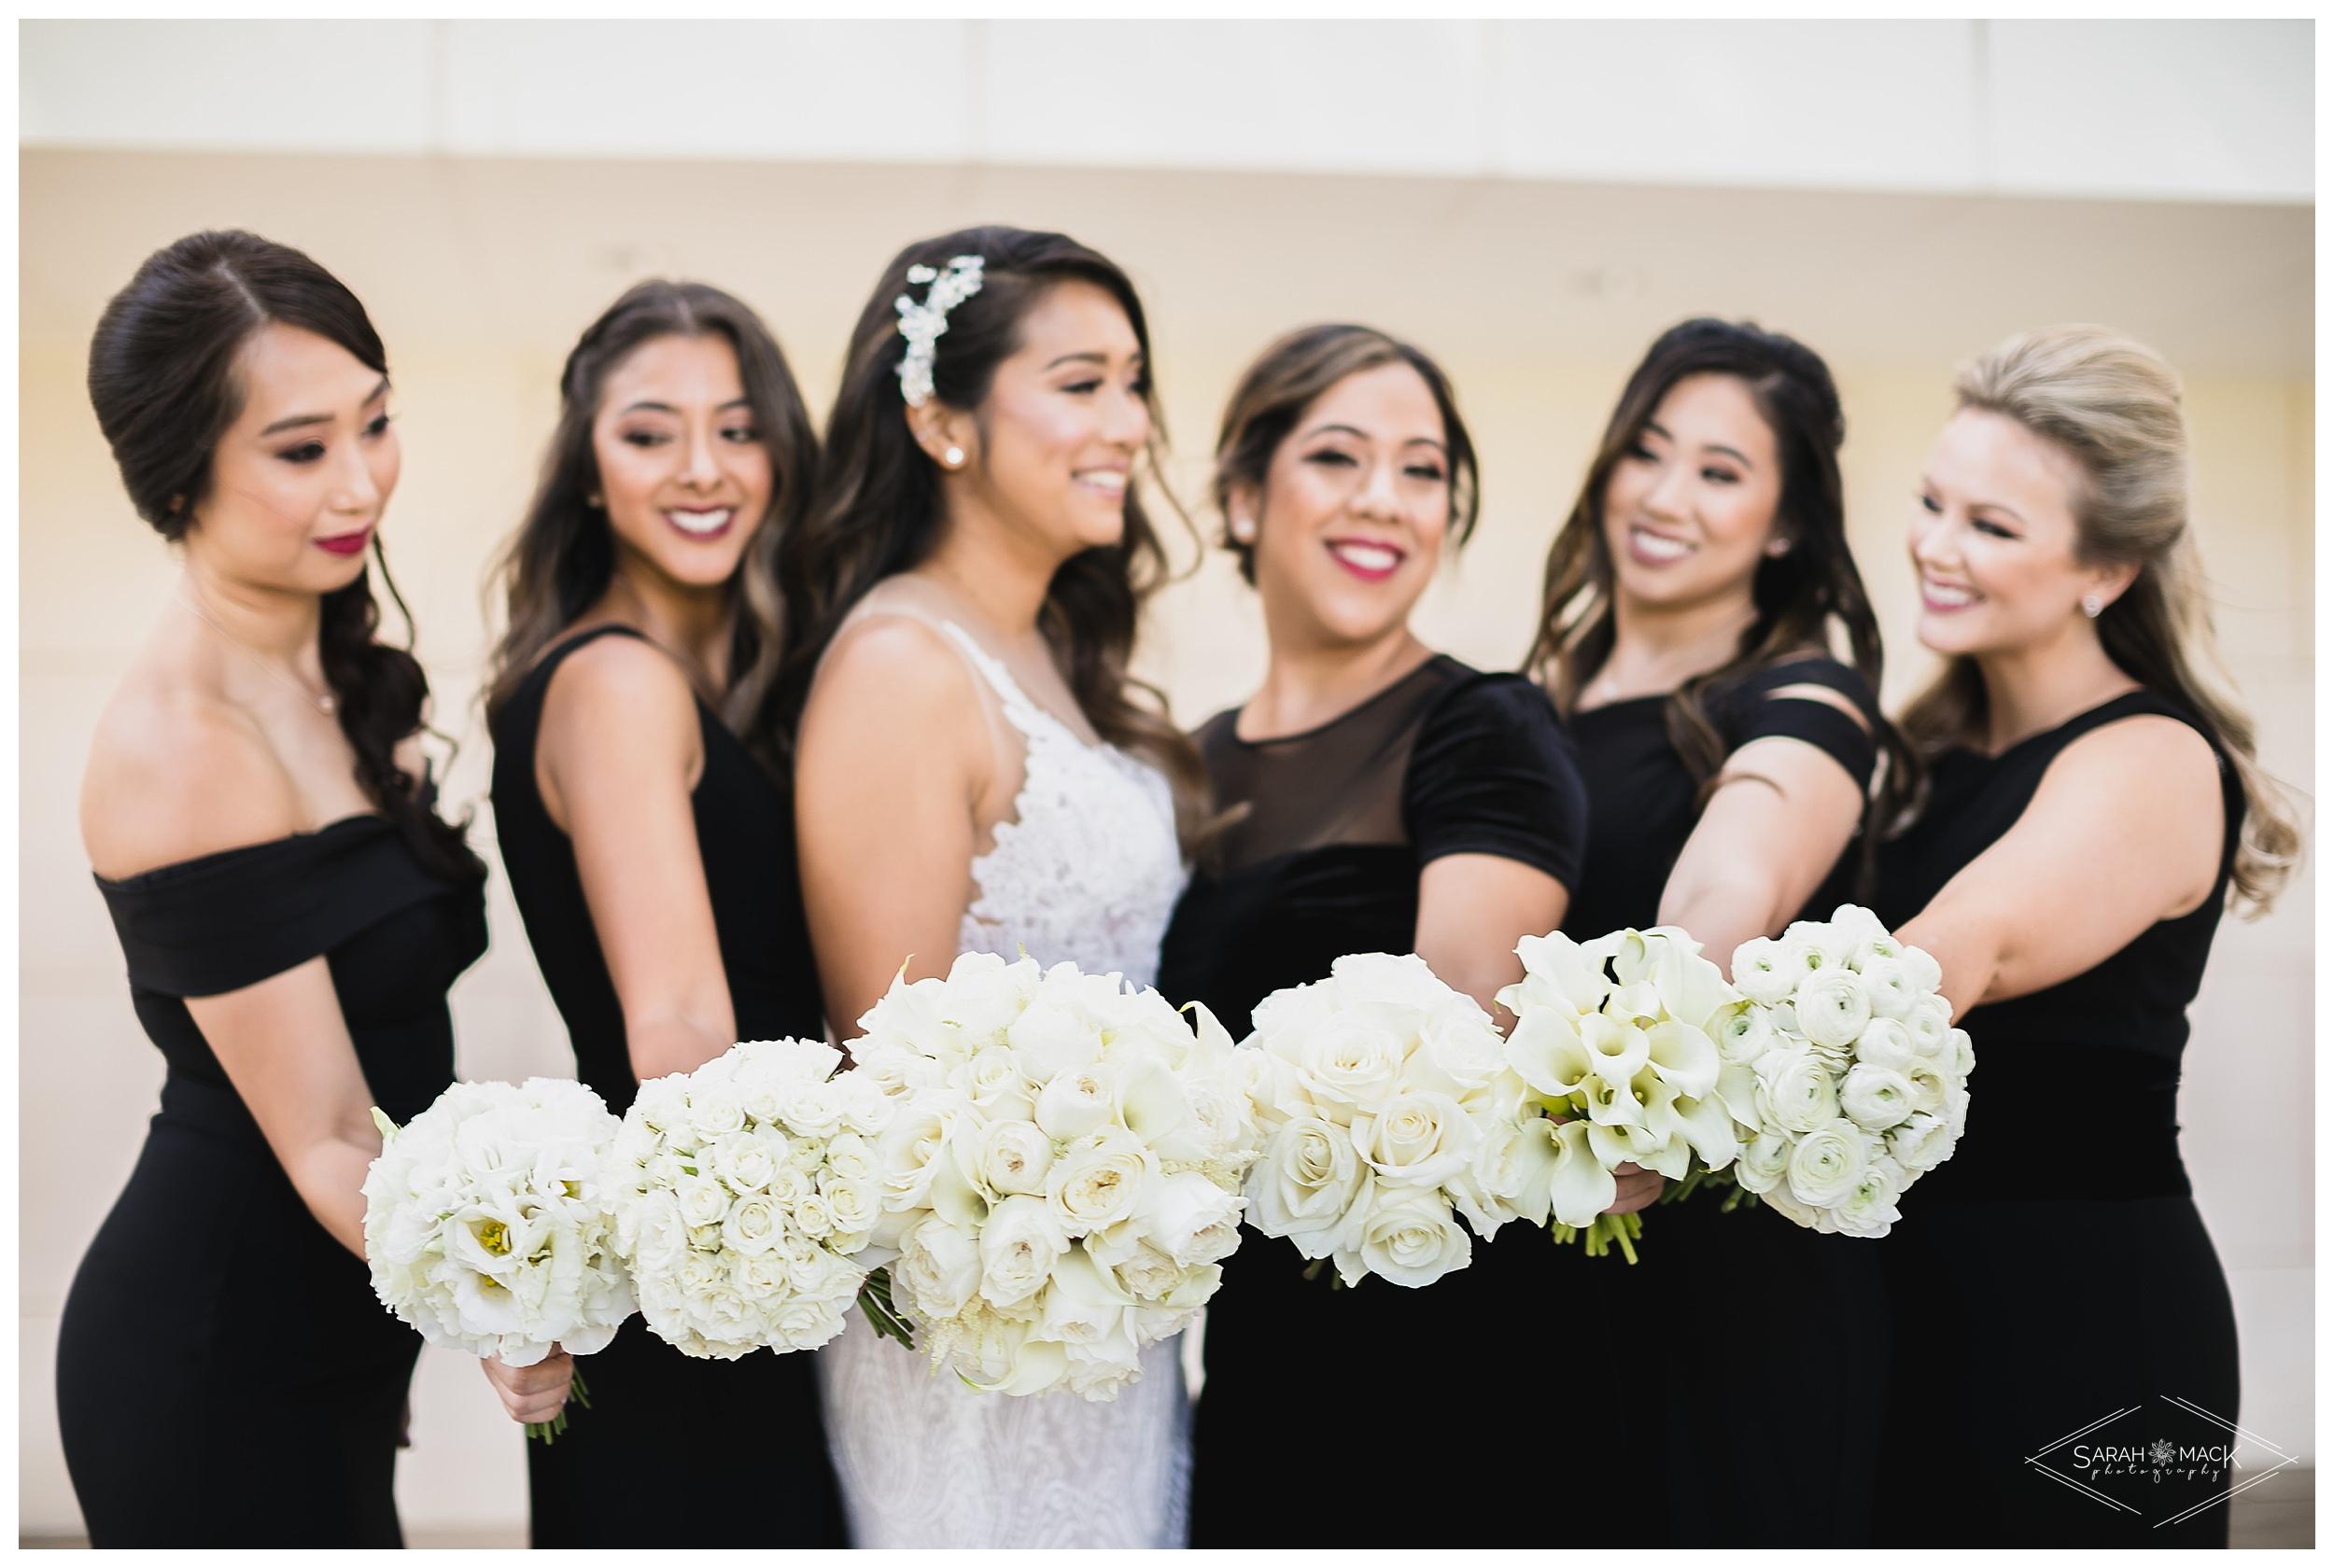 LE-Avenue-of-the-Arts-Costa-Mesa-Wedding-Photography-0101.jpg